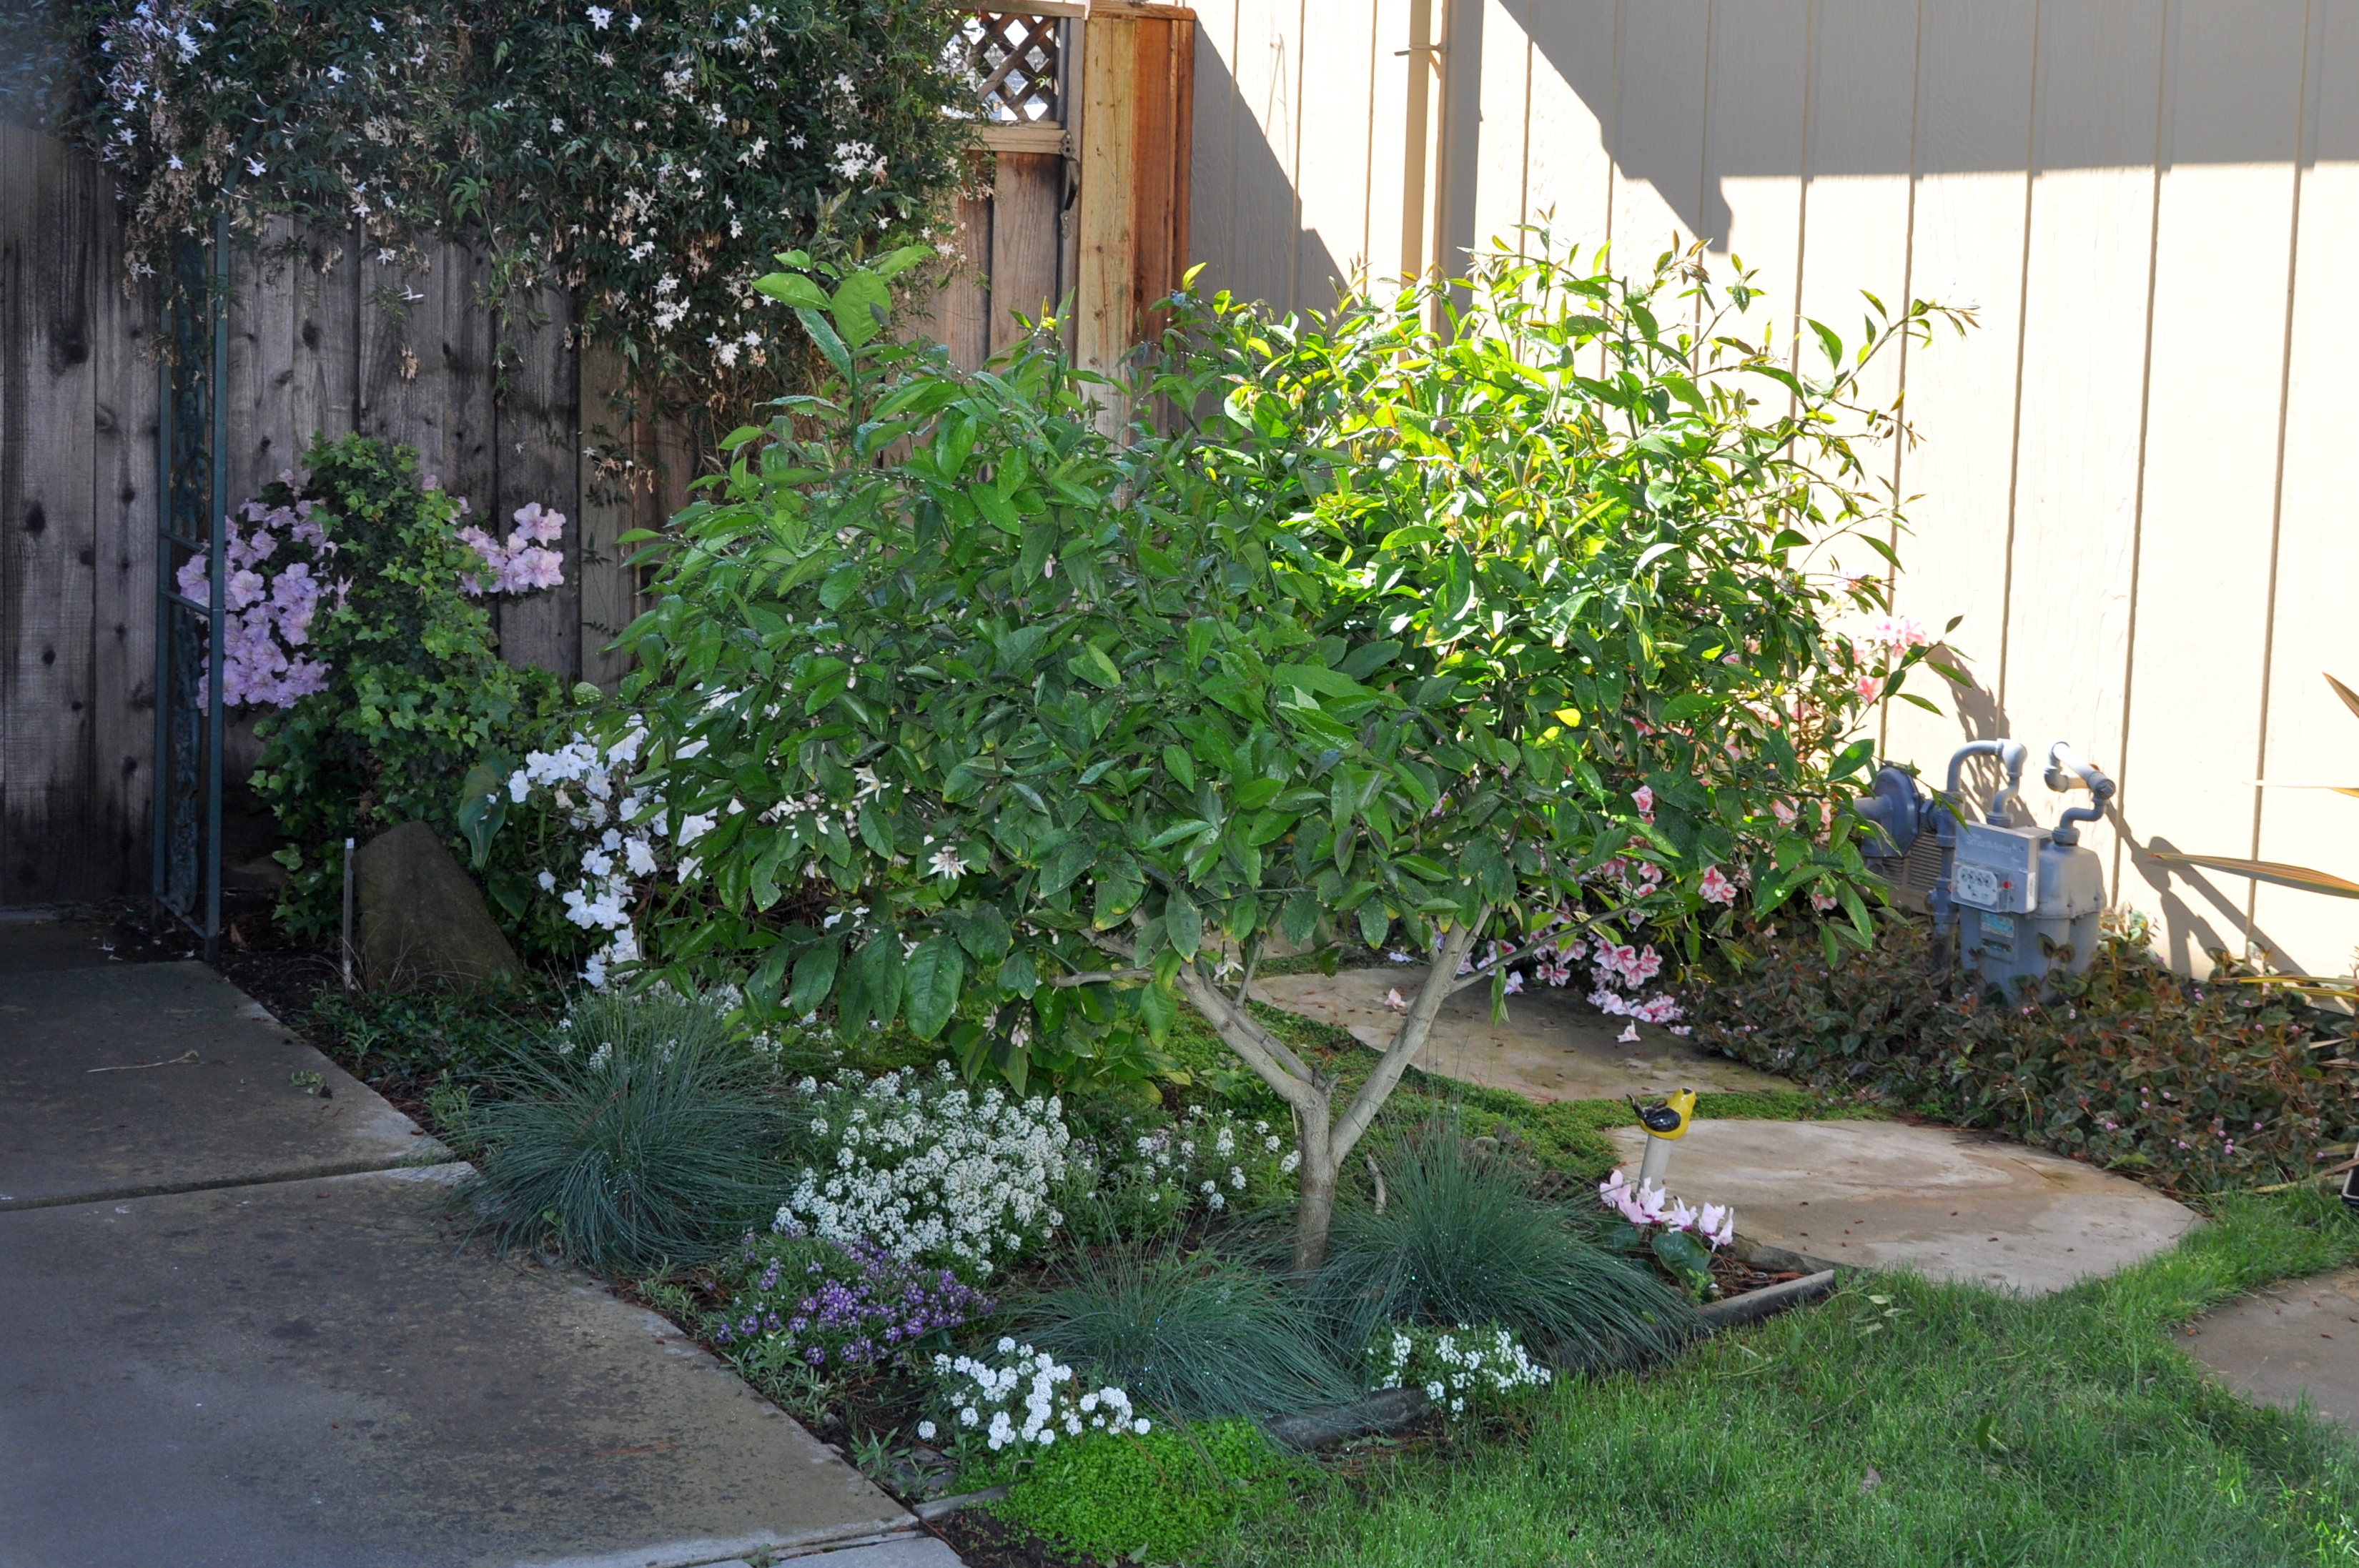 Nostalgia gardening nirvana for Best dwarf trees for front yard